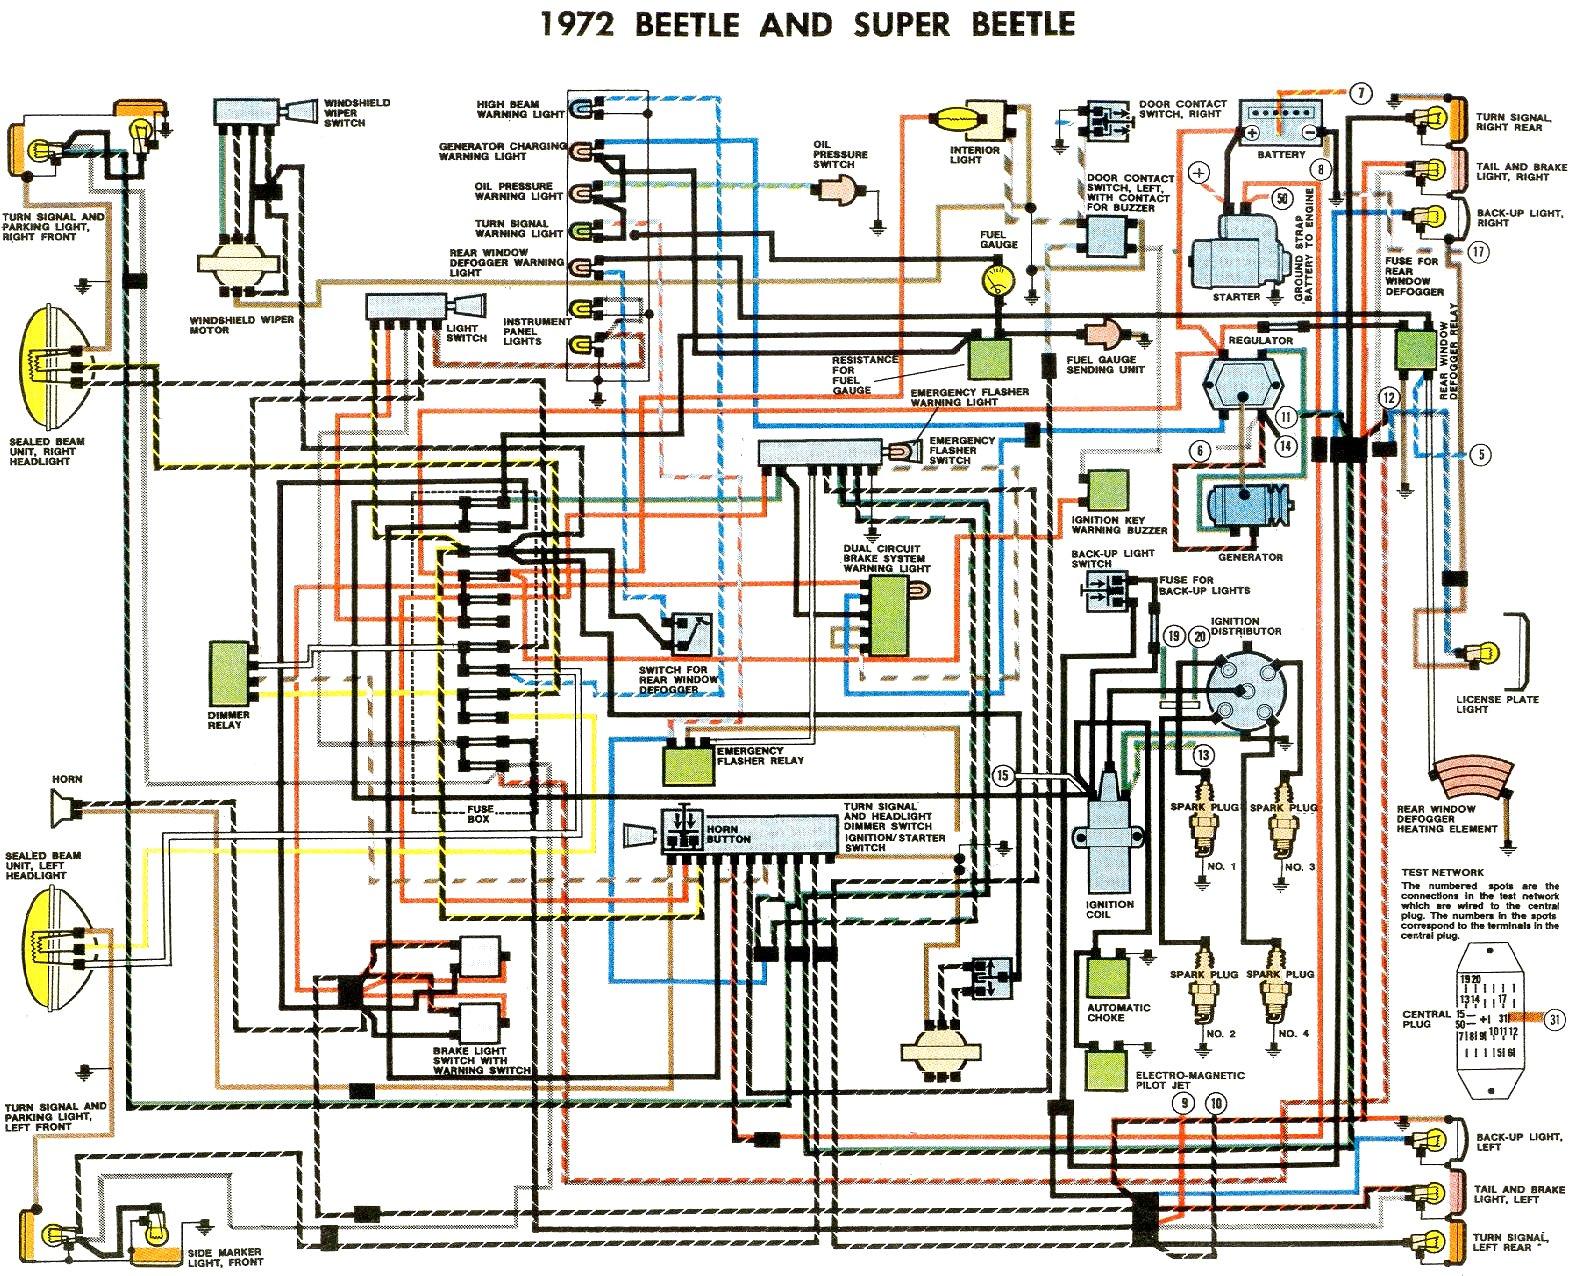 1973 Vw Beetle Engine Diagram New